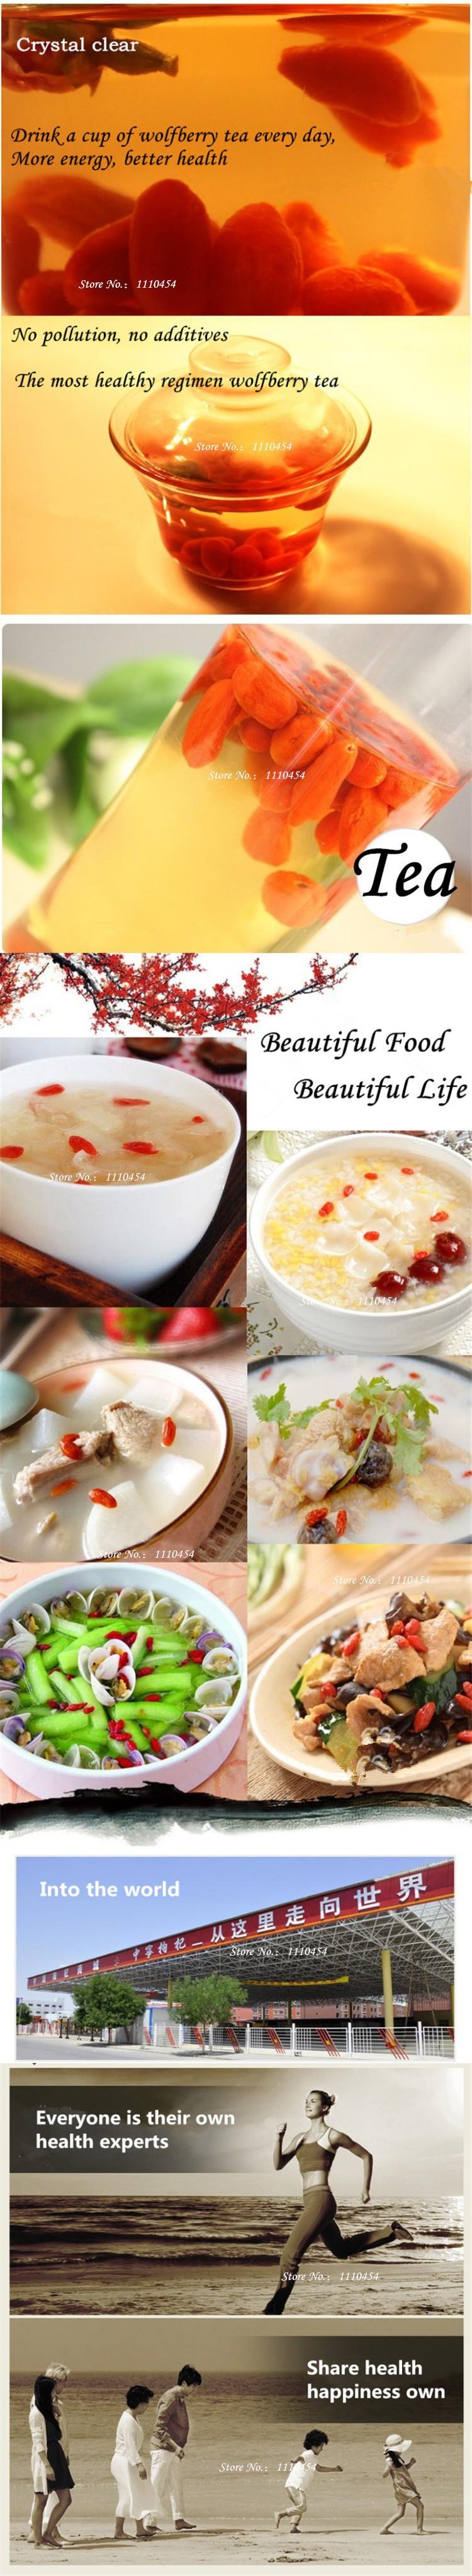 C-TS066 Natural goji ning xia zhong ning goji berry 100g Chinese wolfberry goji berries herbal Tea green food for health